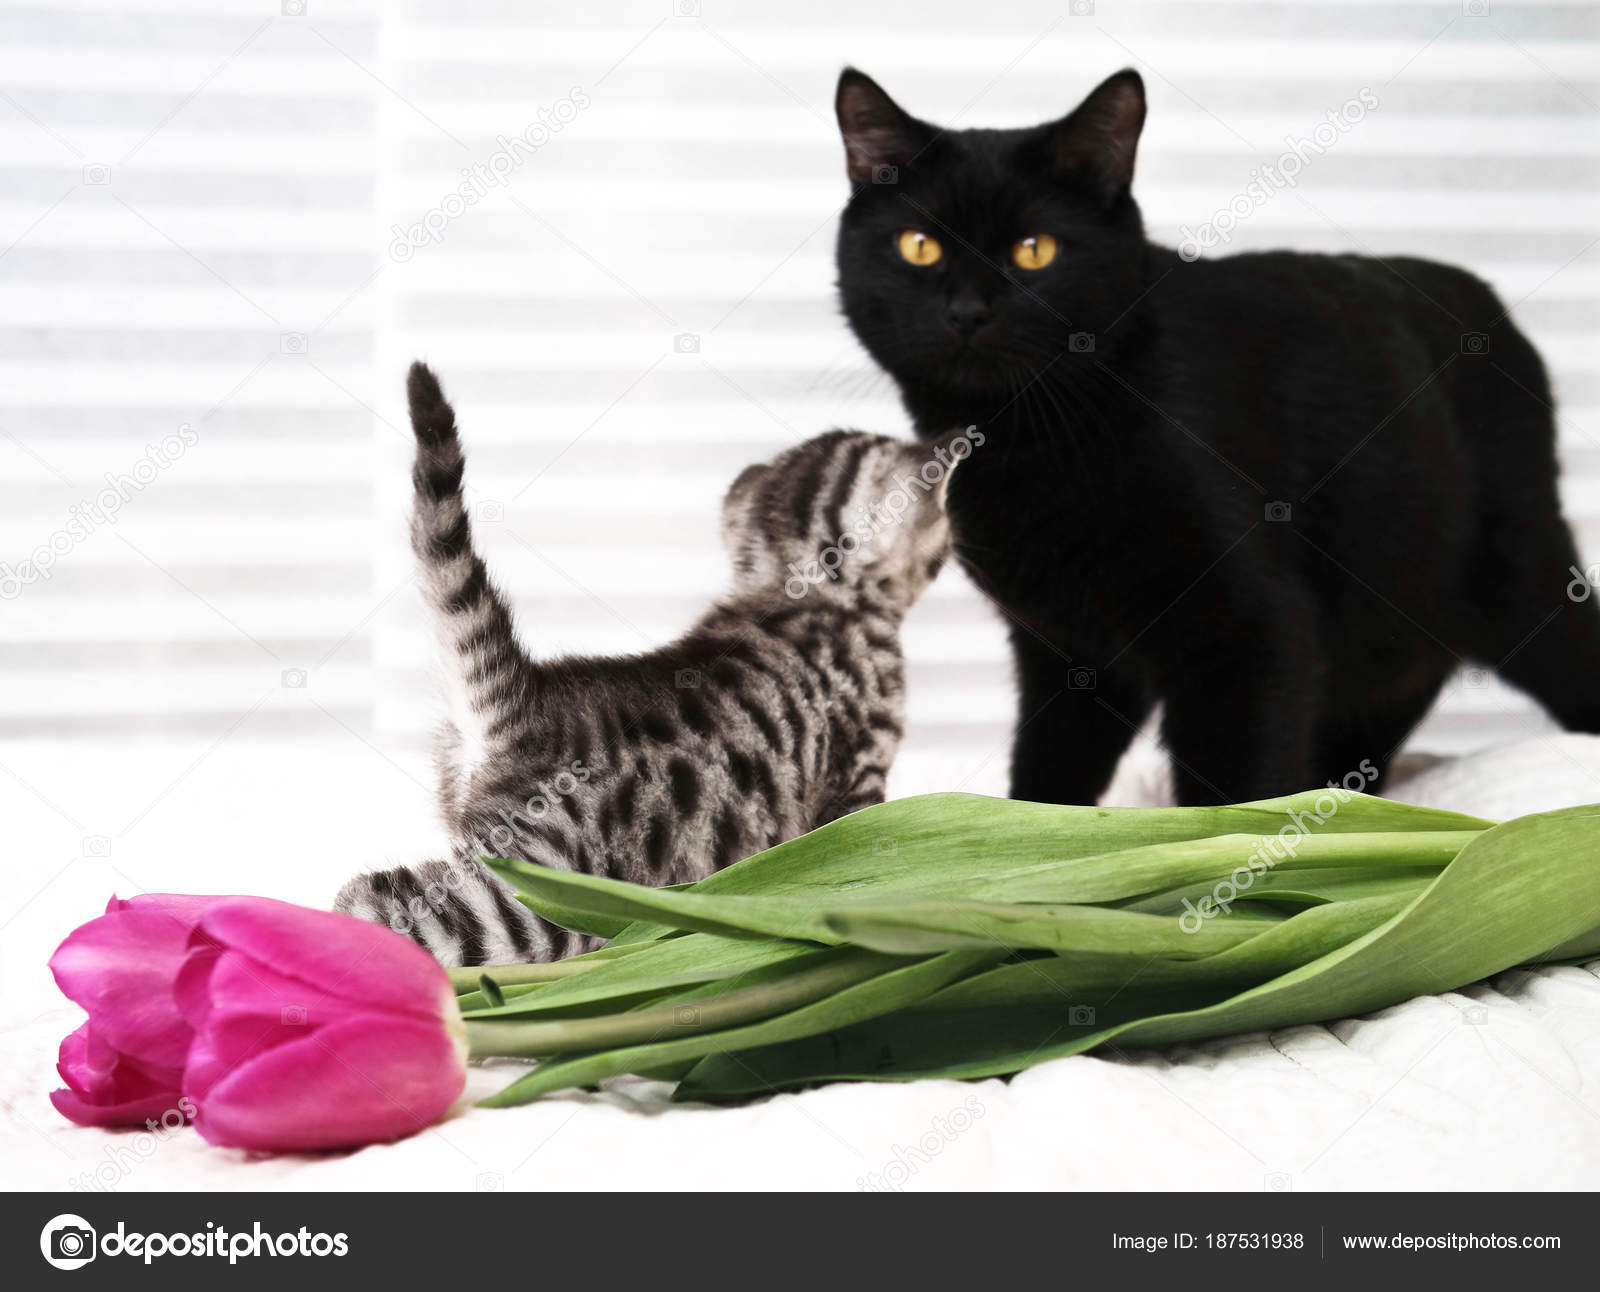 černá kočička na eben chlupatý kočička kurva